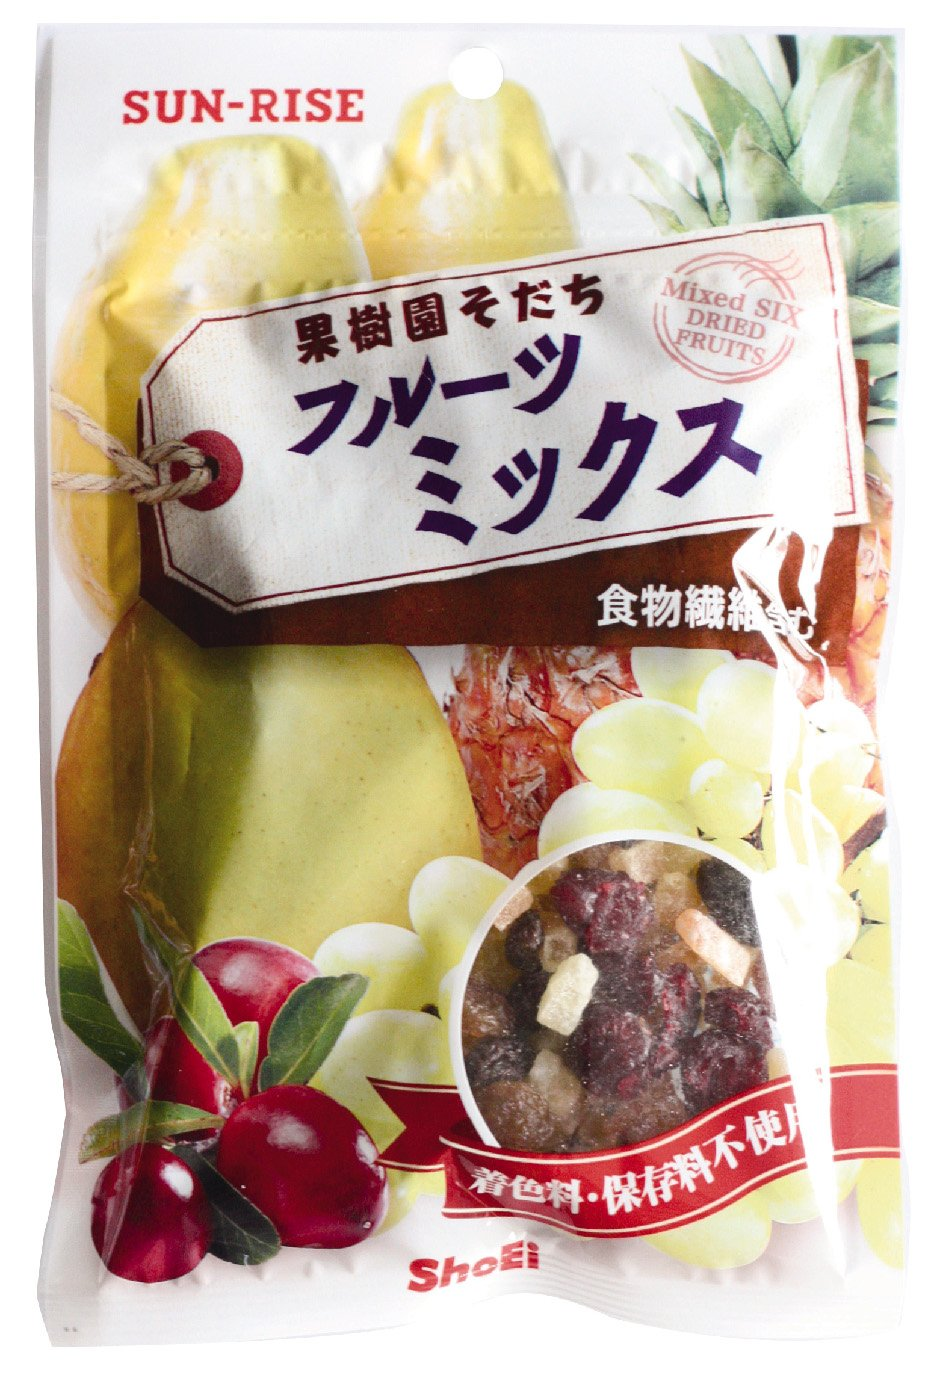 SUNRISE fruit mix 100gX12 bags